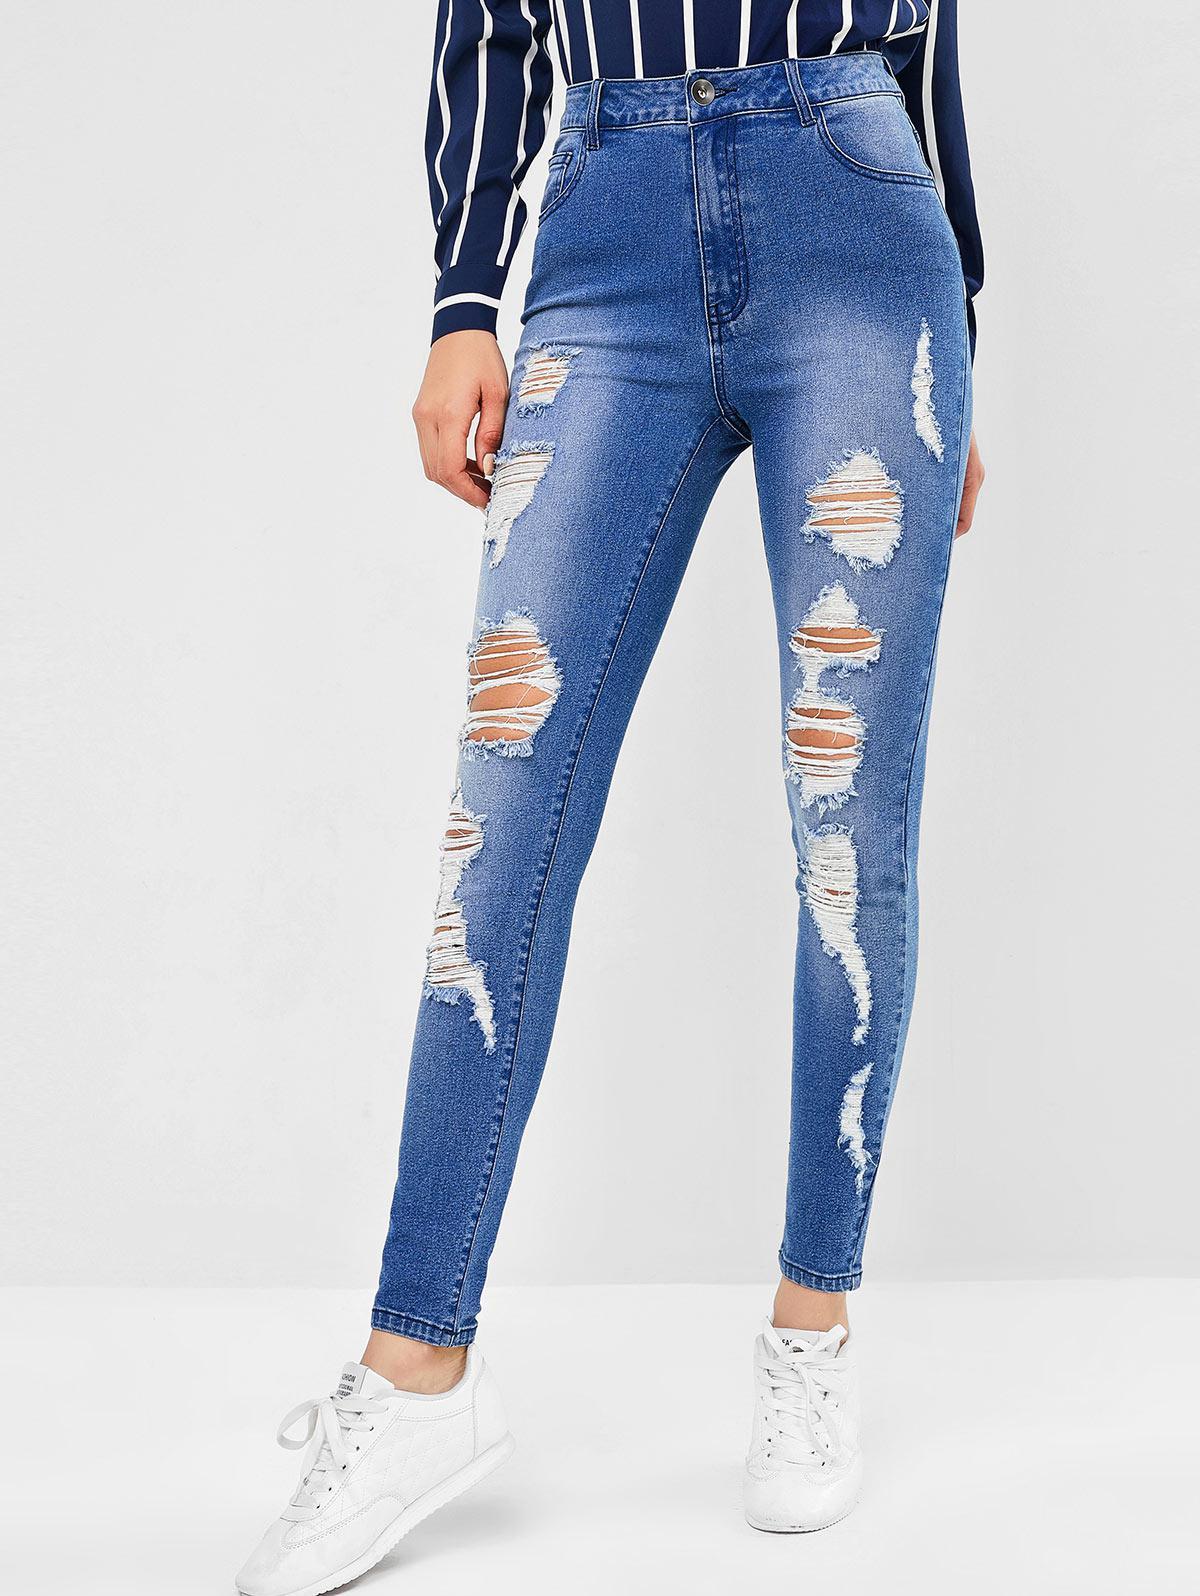 ZAFUL Ripped Skinny Jeans, Jeans blue